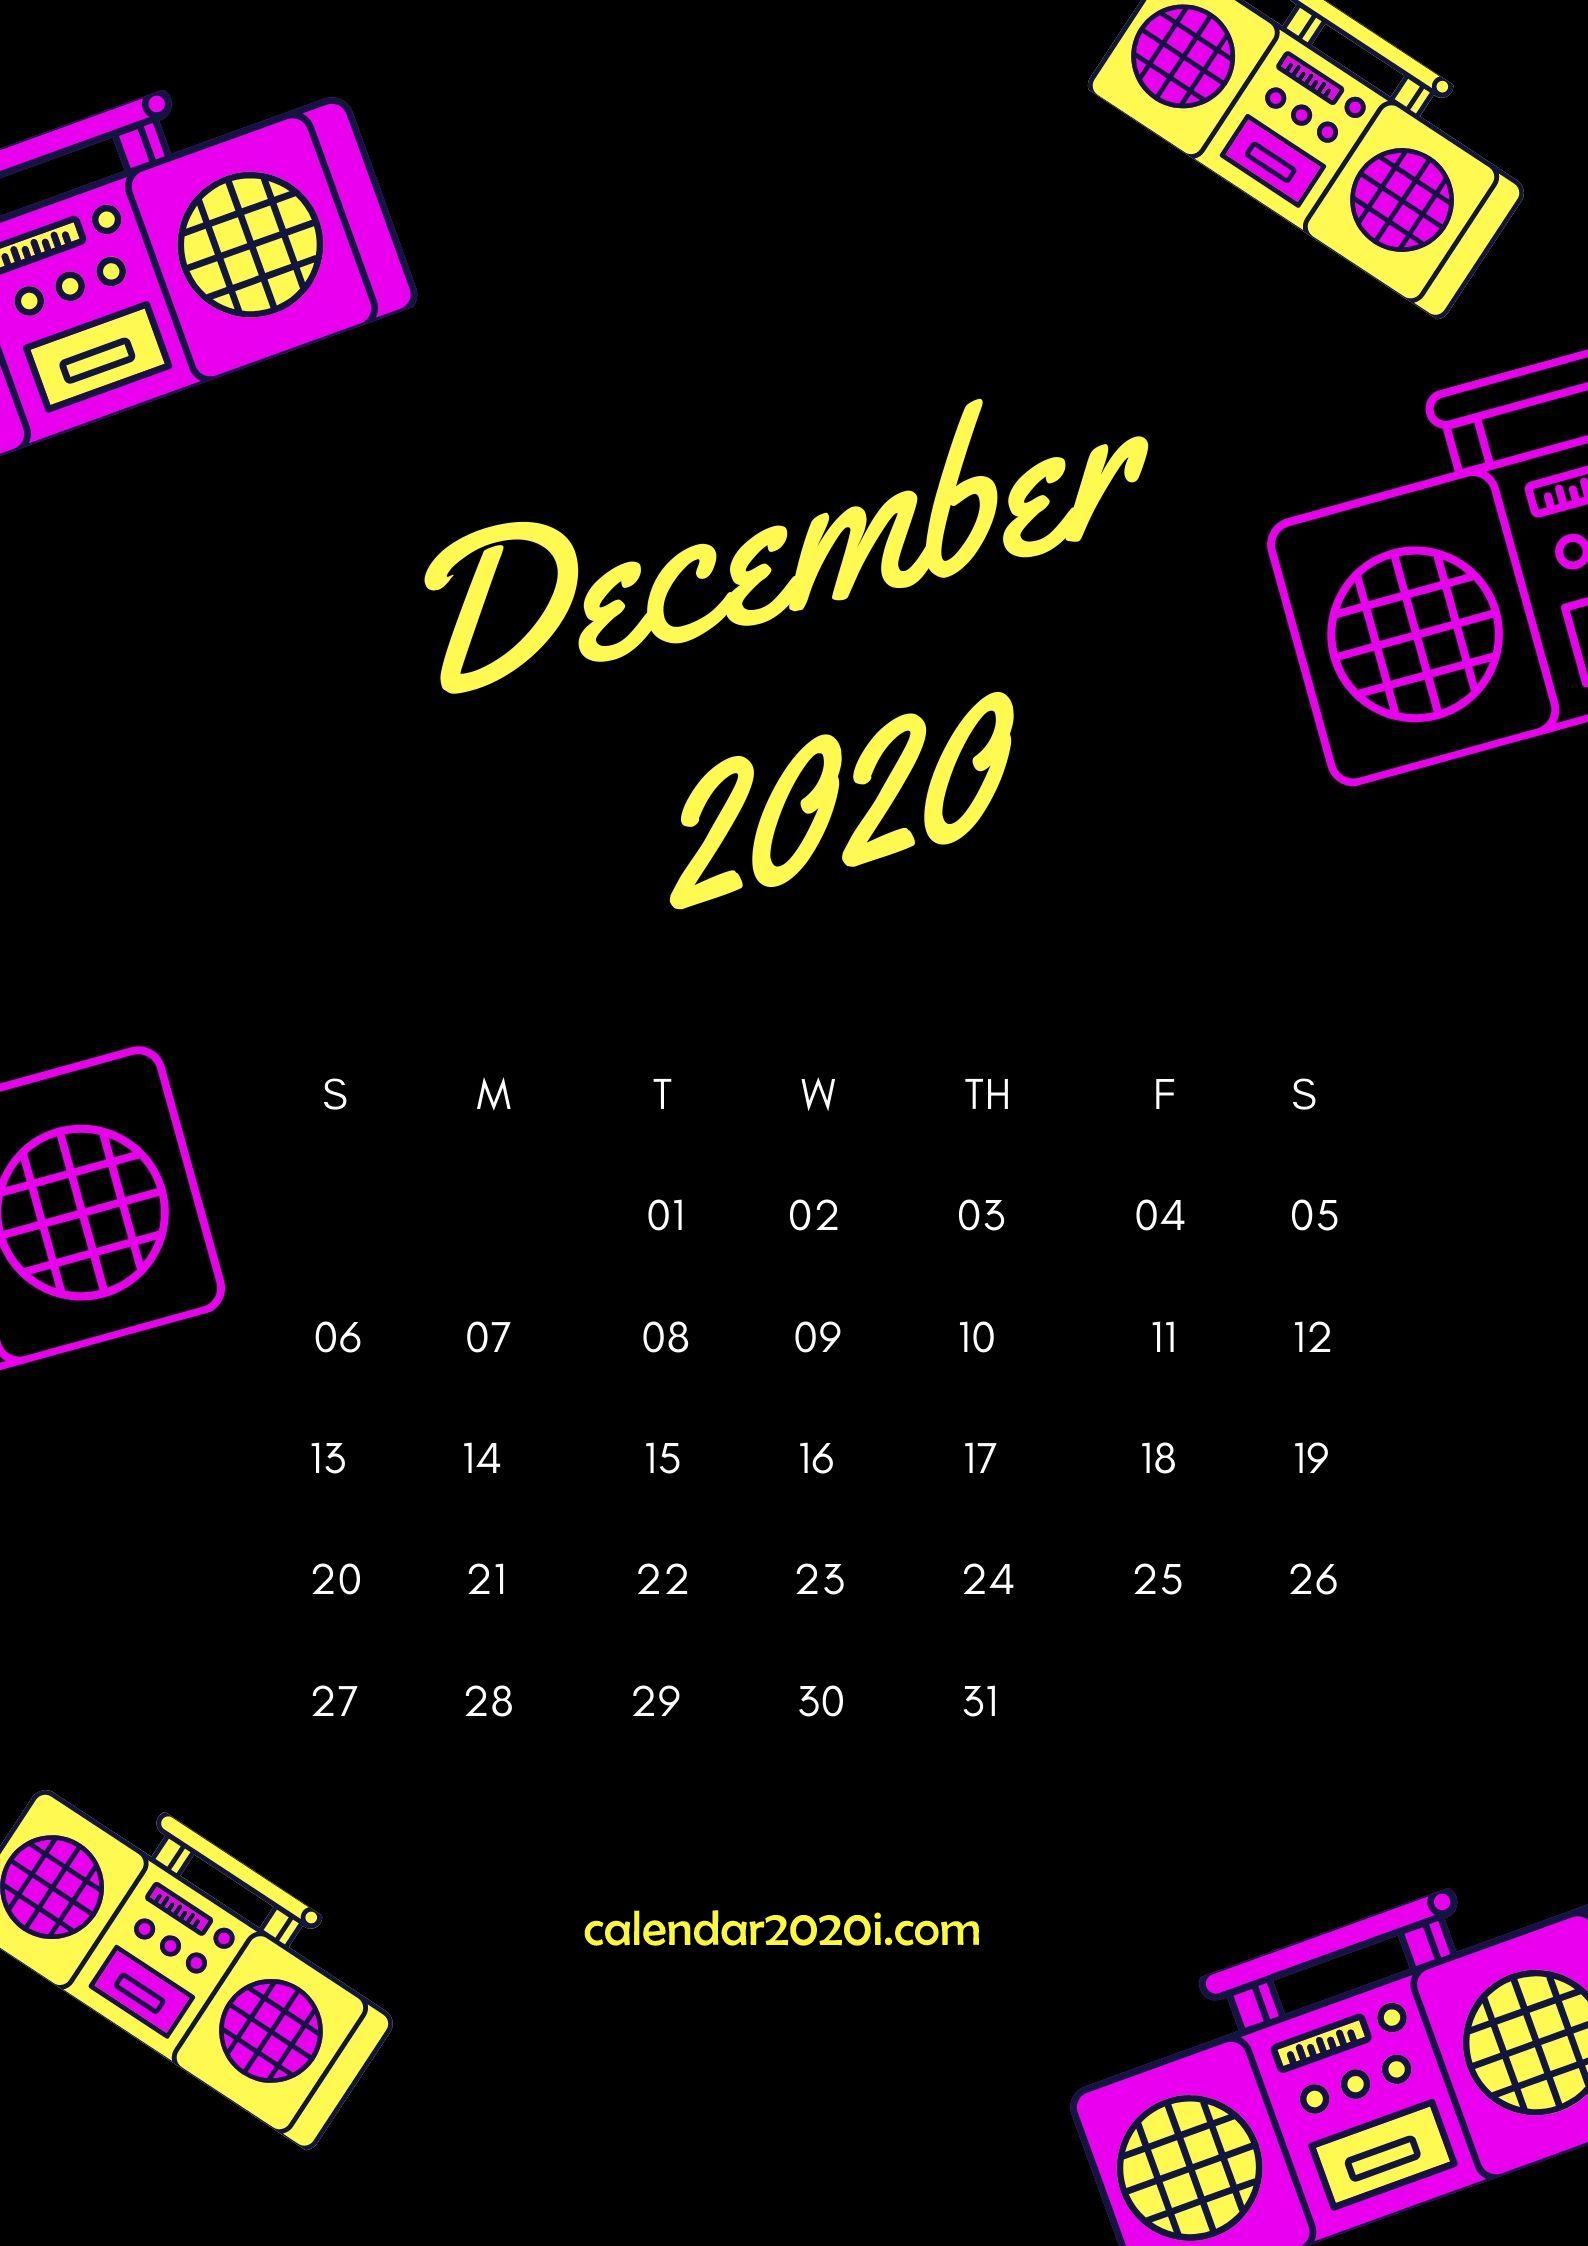 December 2020 Wall Calendar Printable